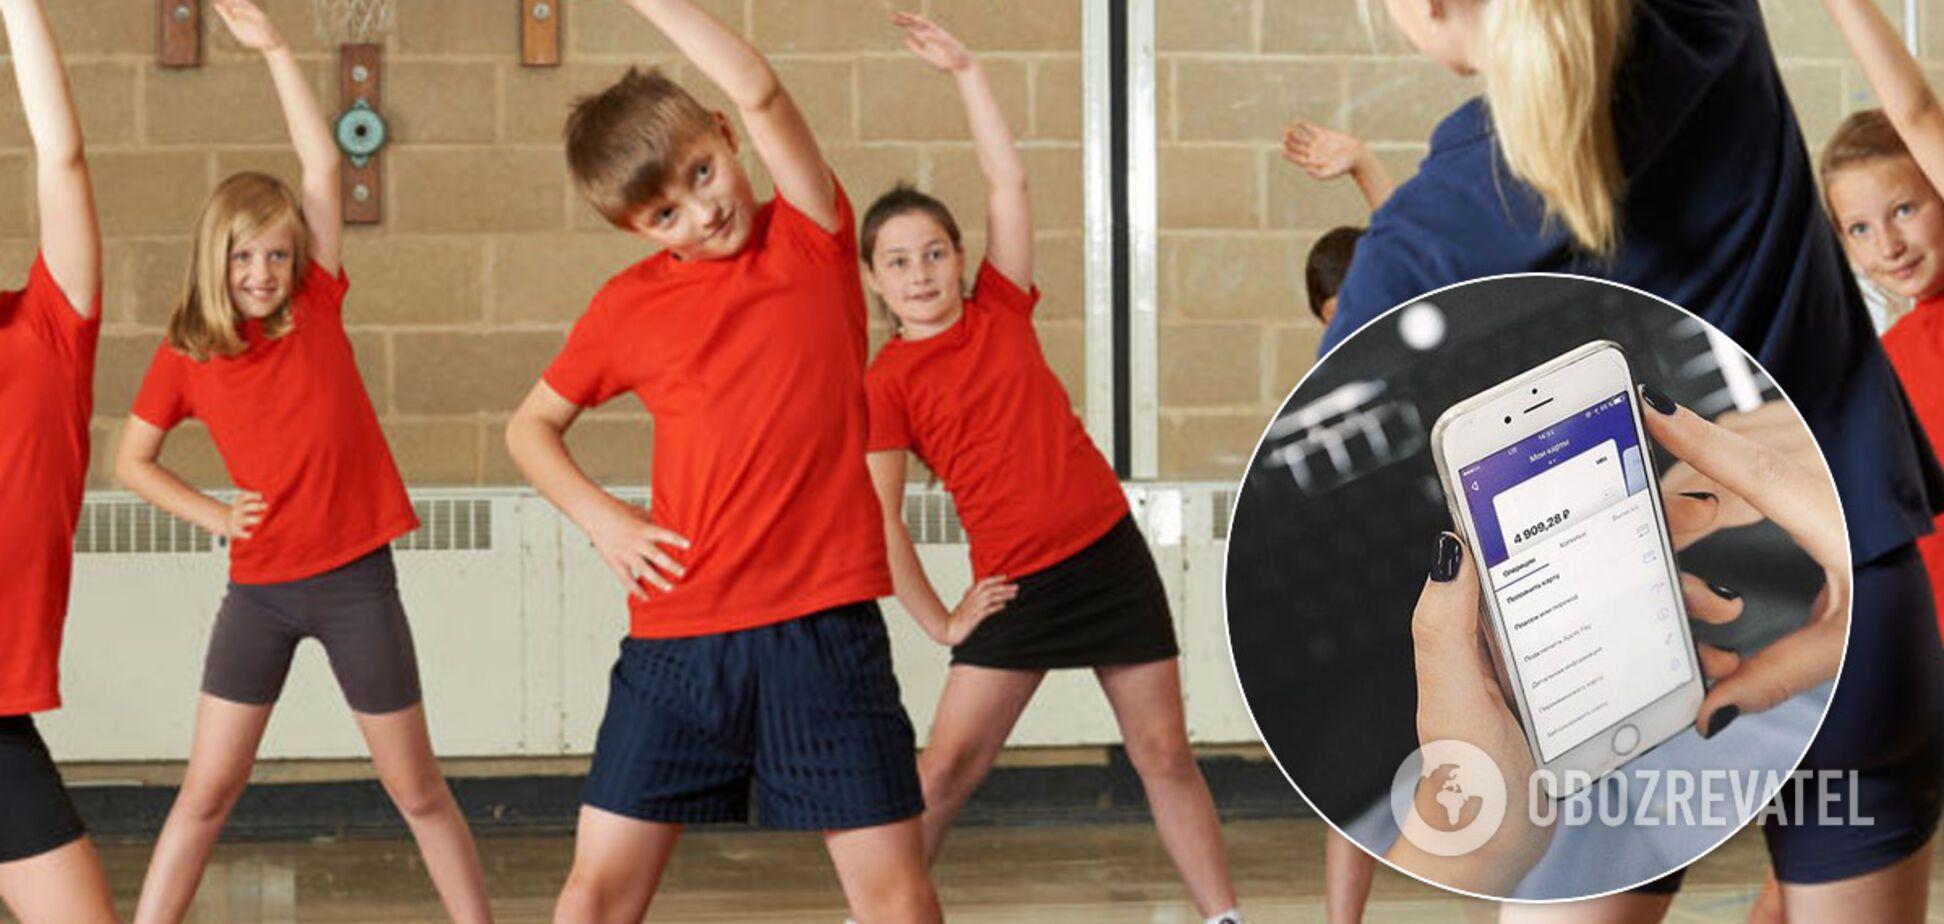 Уроки физкультуры начали проводить онлайн из-за коронавируса. Фото